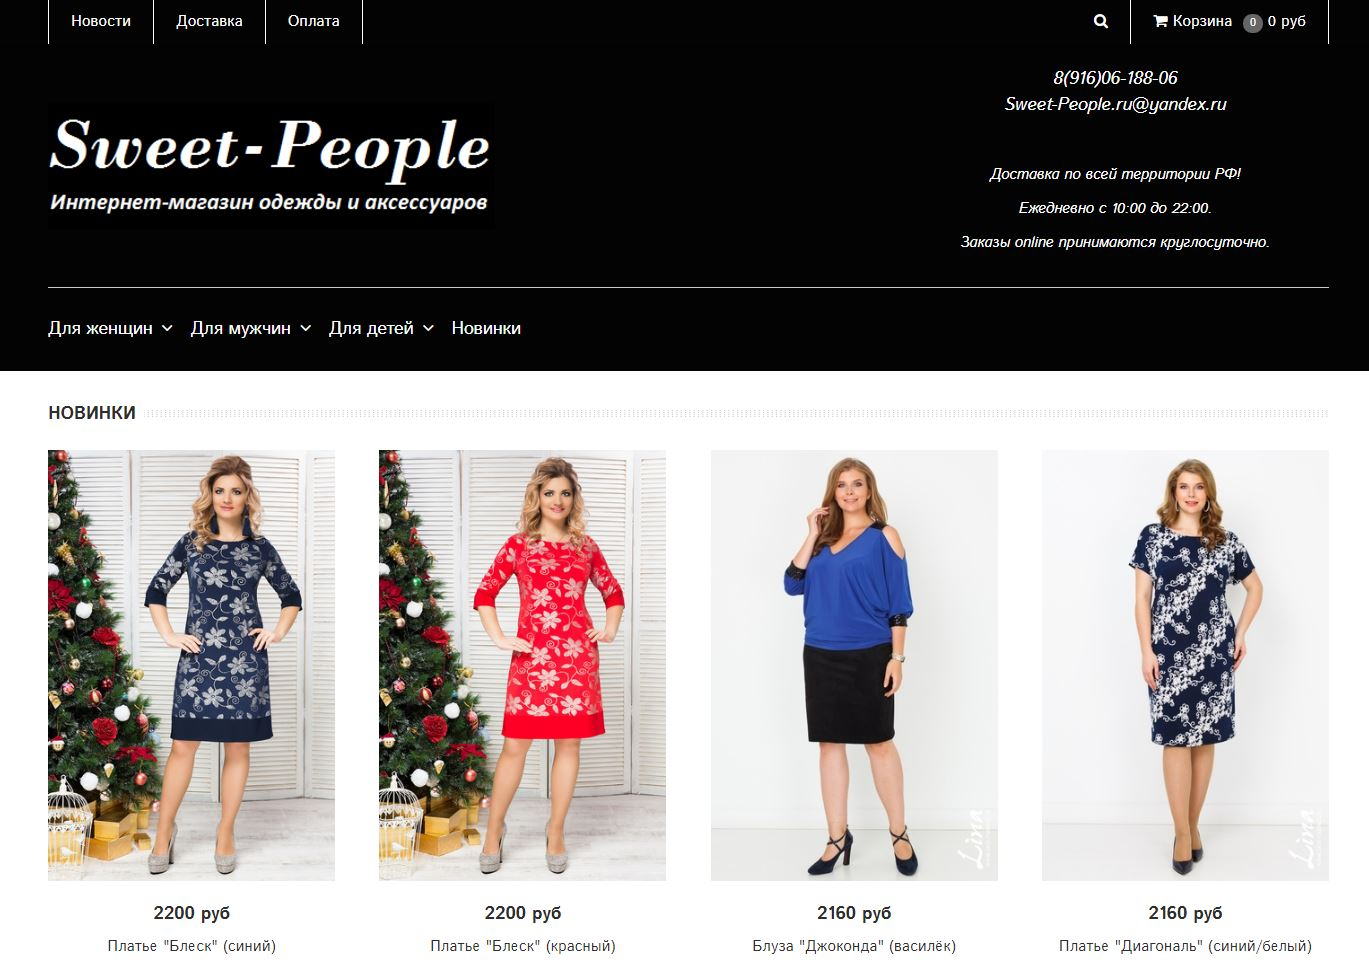 Одежда Онлайн Самая Дешевая